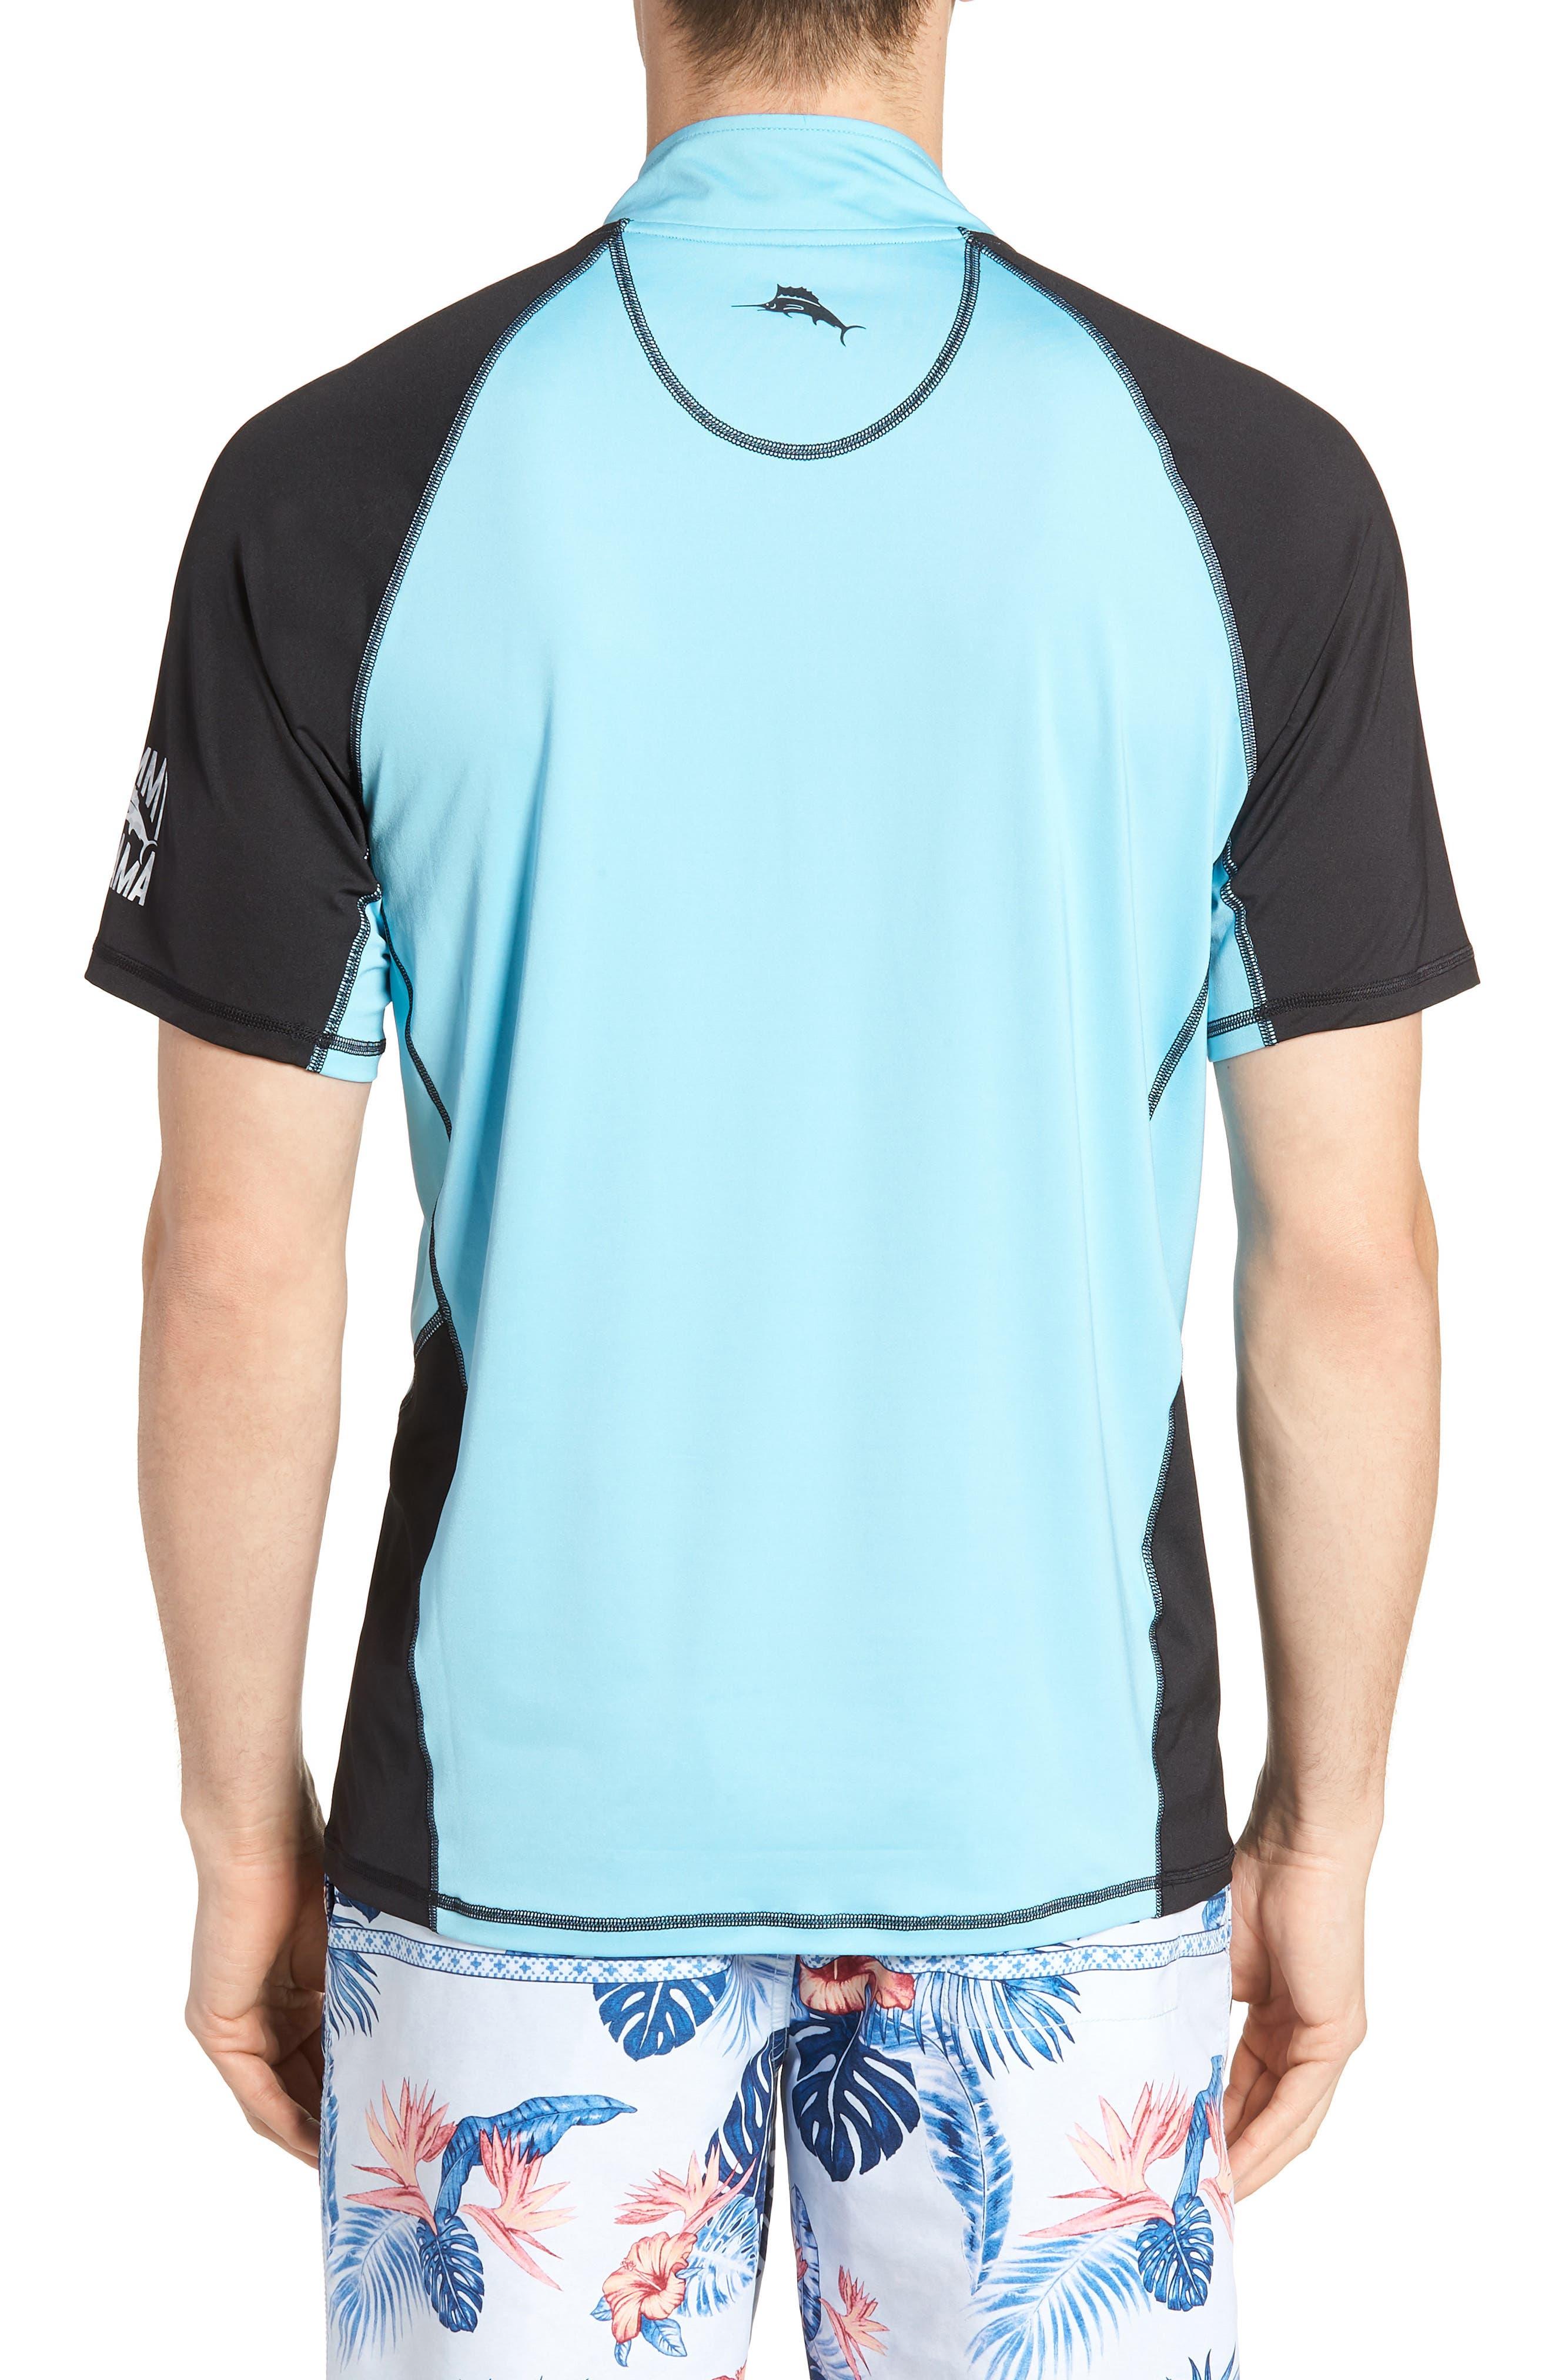 IslandActive<sup>™</sup> Colorblock Beach Pro Rashguard T-Shirt,                             Alternate thumbnail 2, color,                             400